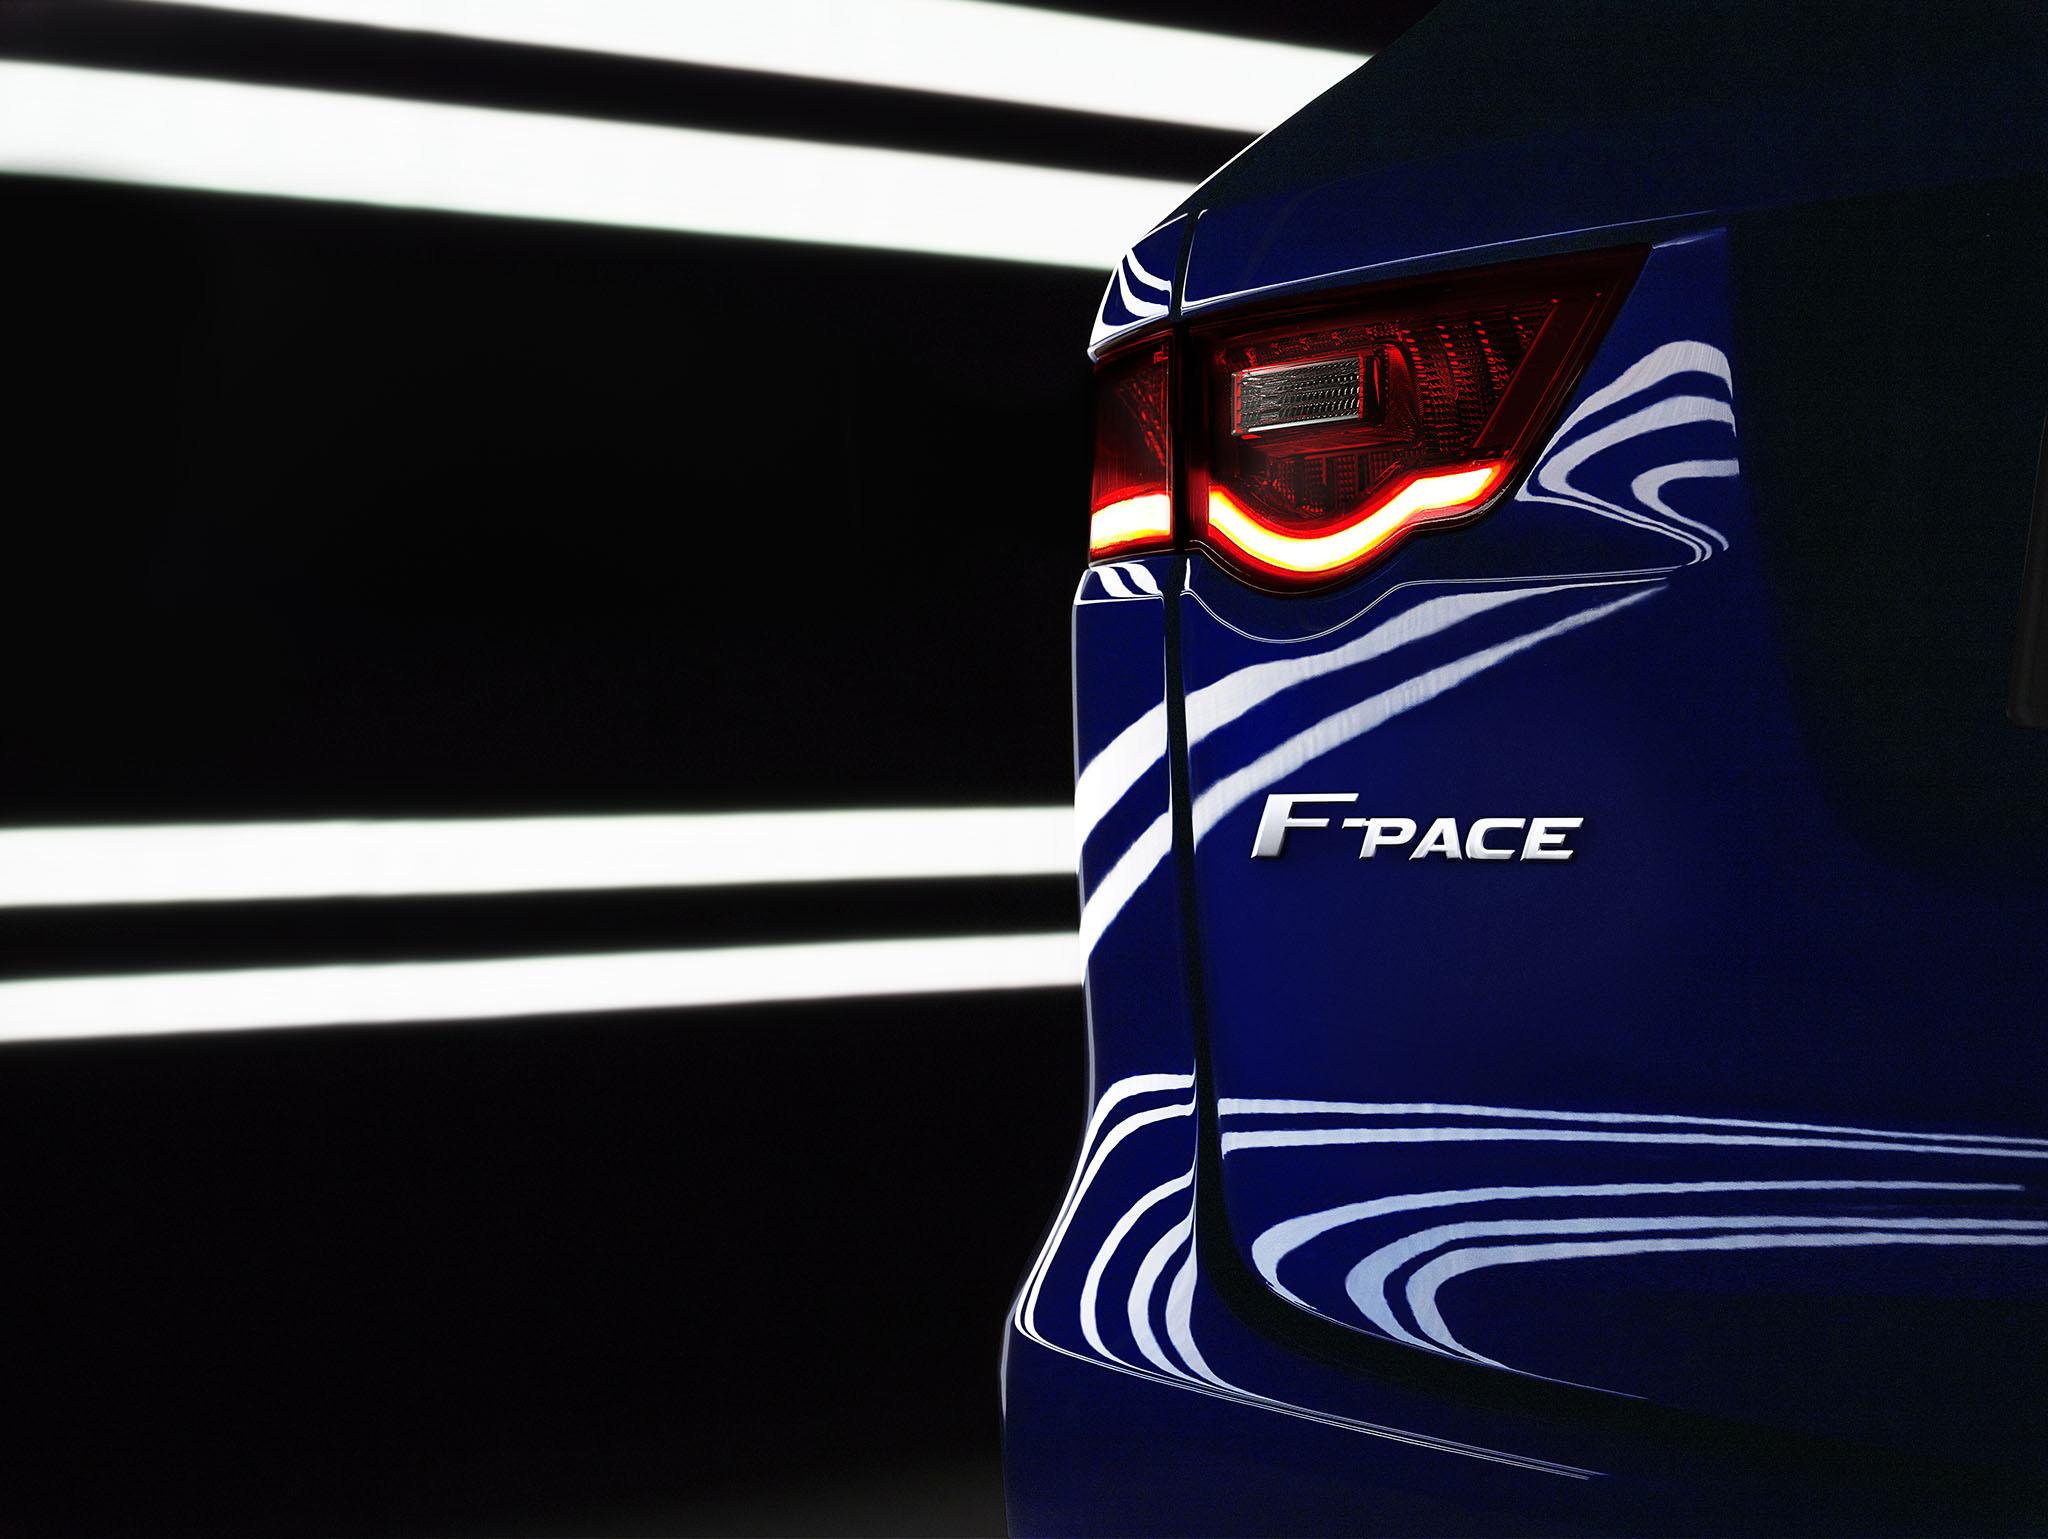 JaguarFPace 01